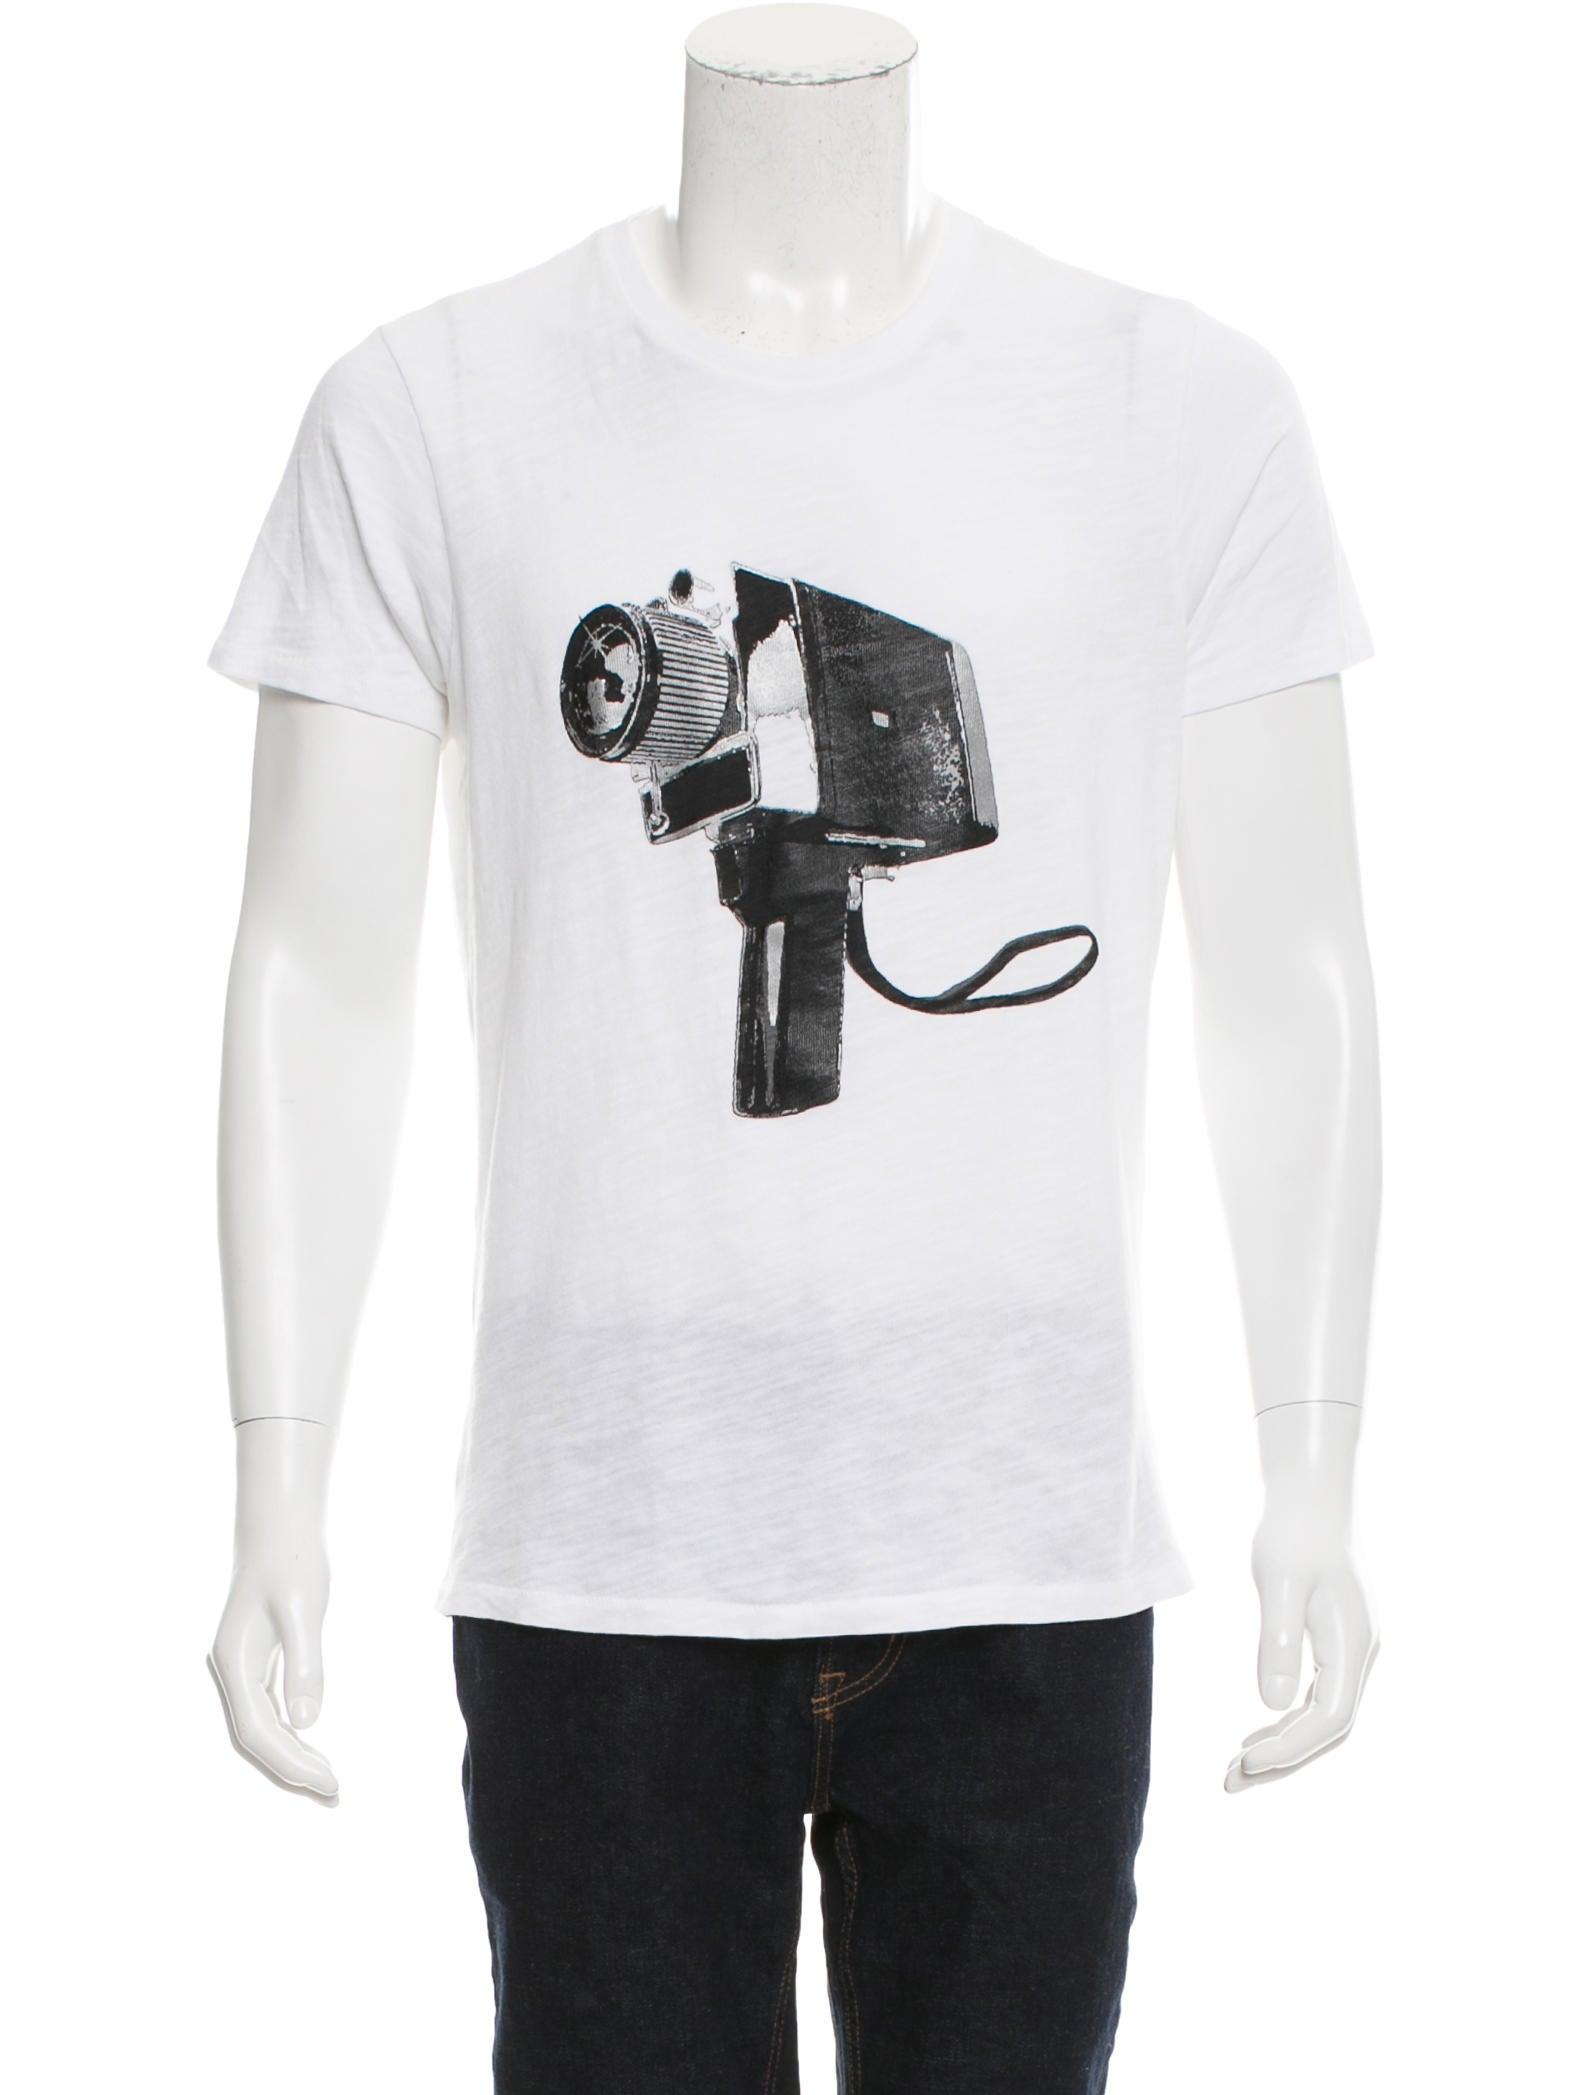 Rag bone hand camera crew neck t shirt clothing for Rag and bone t shirts